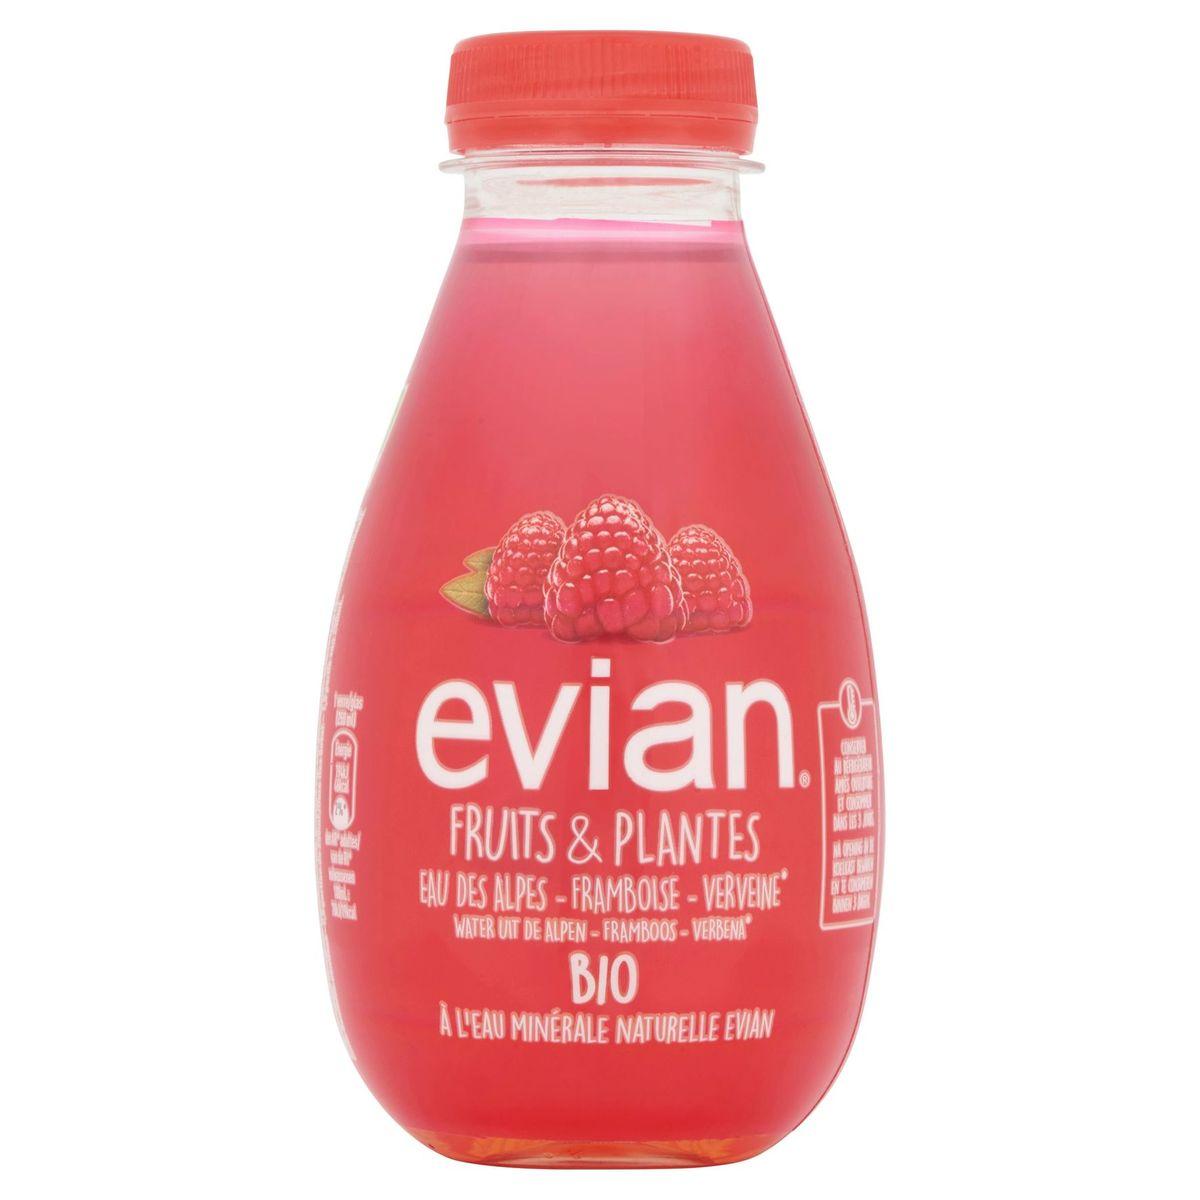 Evian Fruits & Plantes Water uit de Alpen Framboos Verbena Bio 37 cl